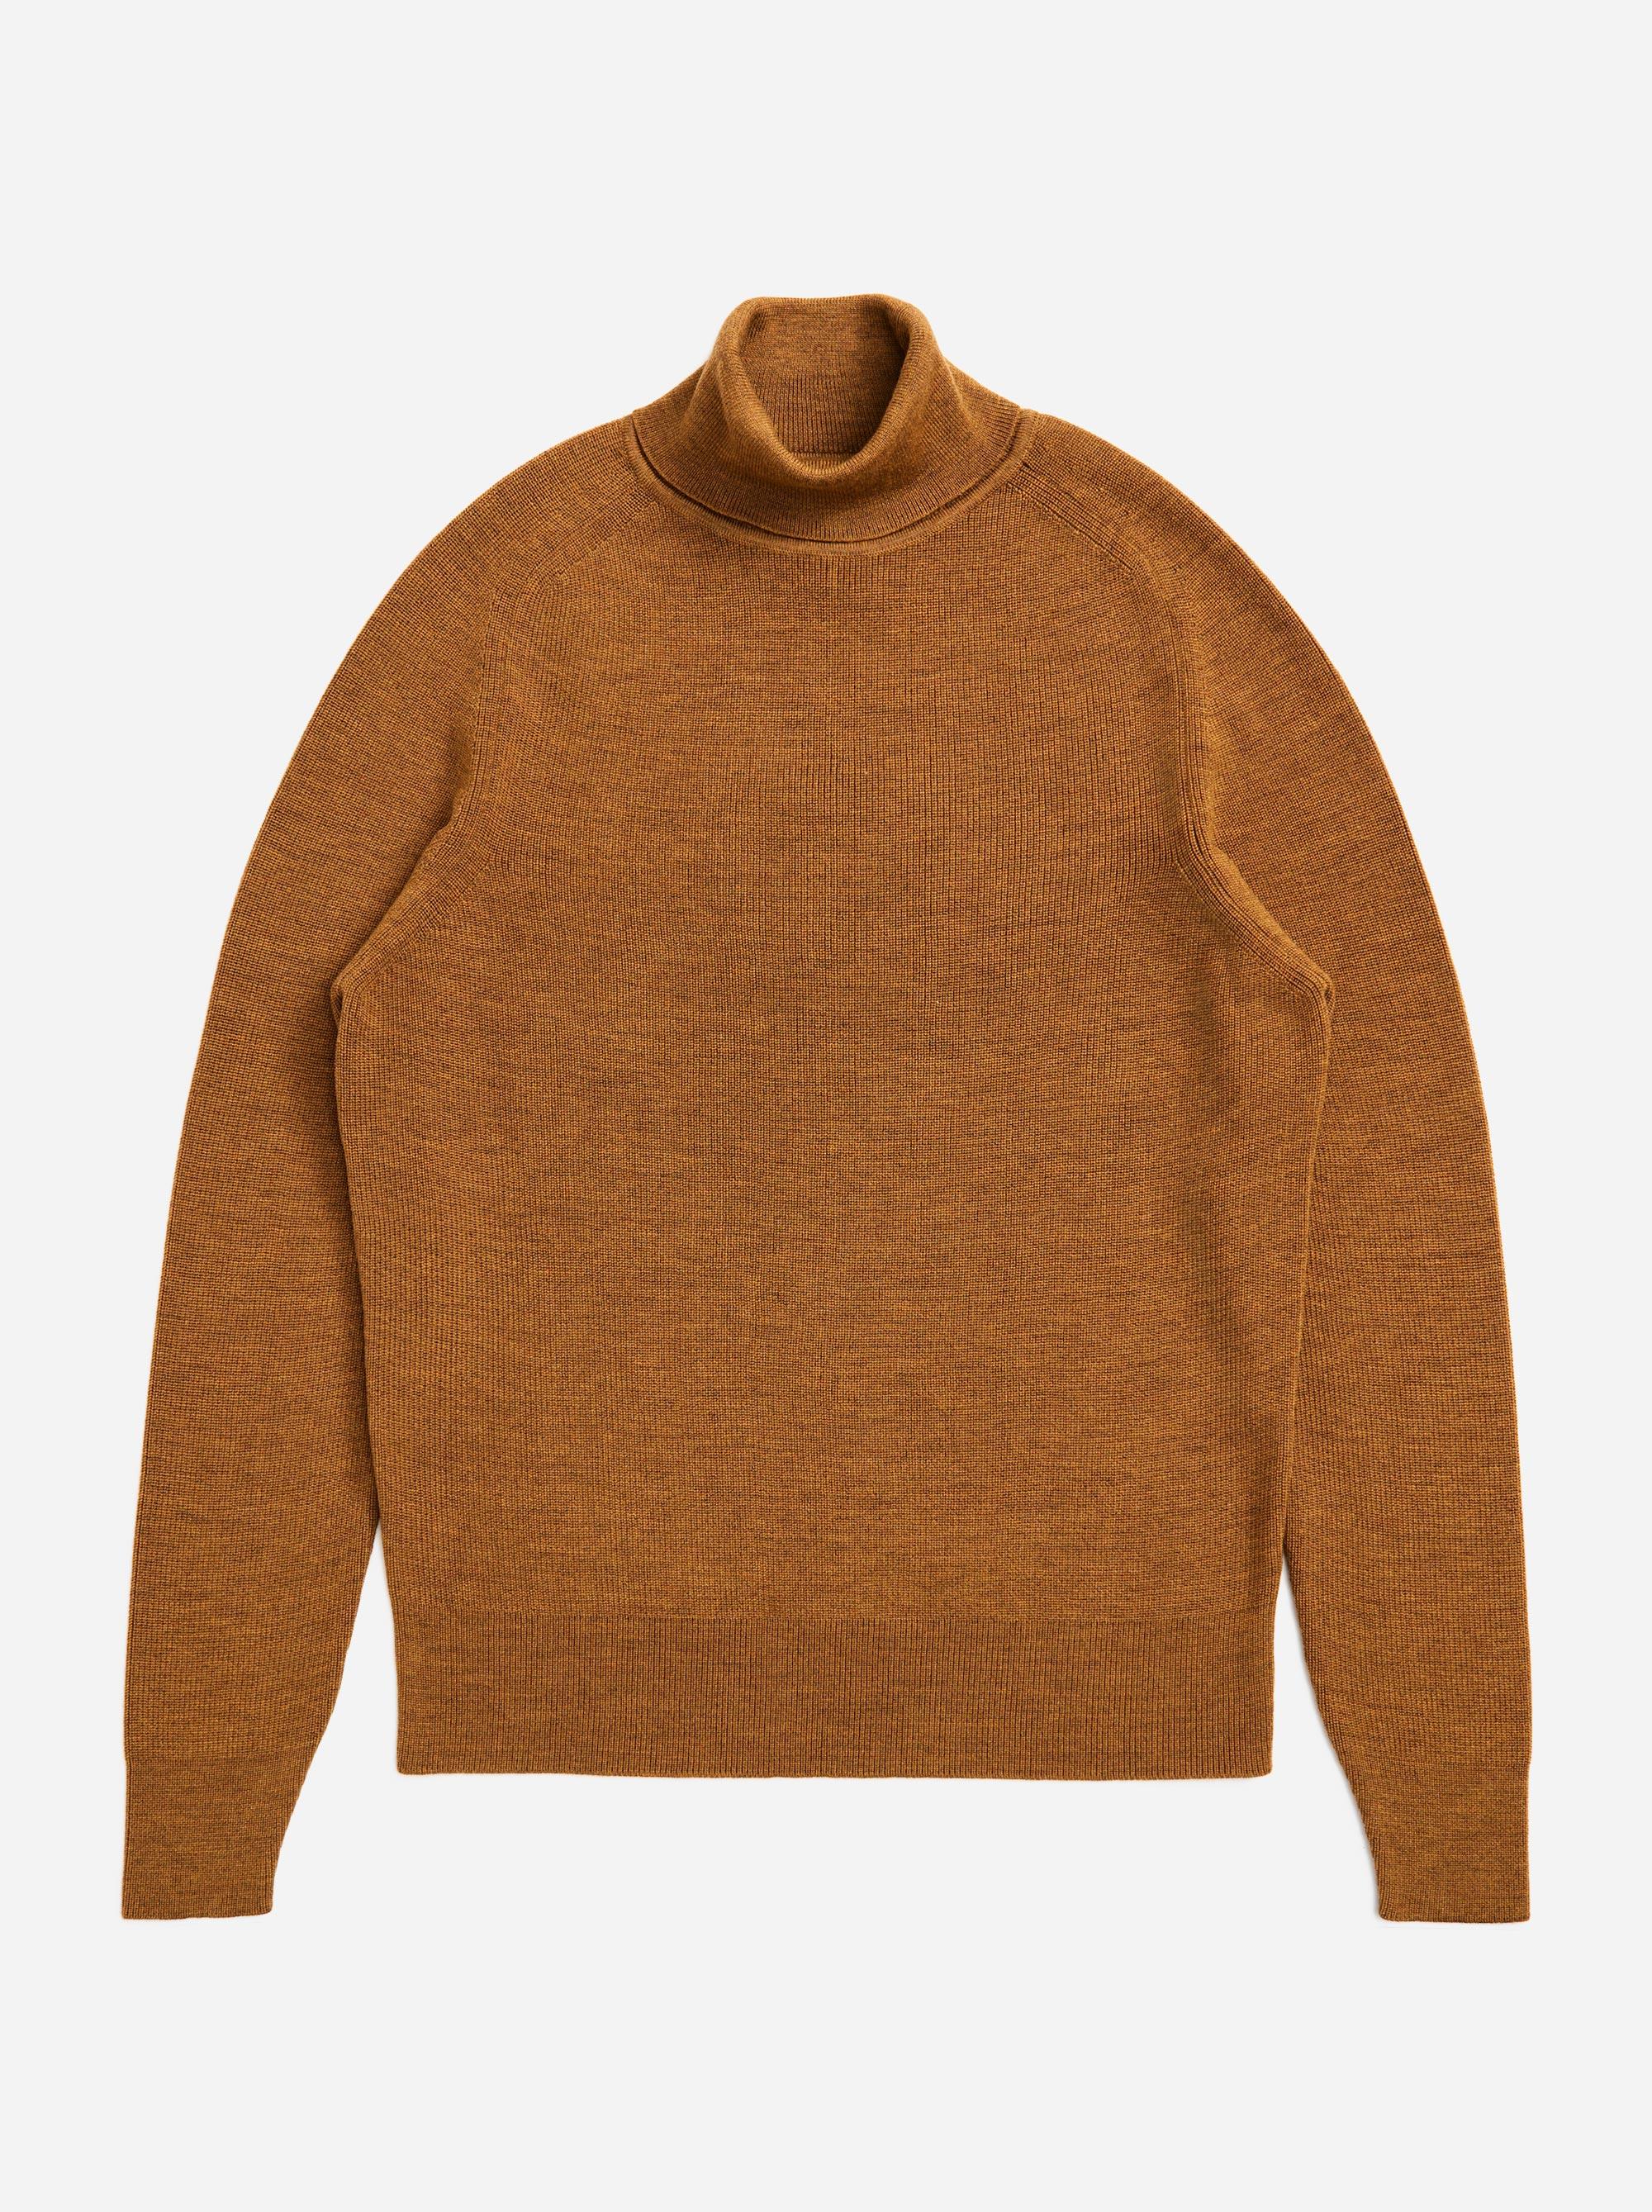 Teym - Turtleneck - The Merino Sweater - Men - Mustard - 5